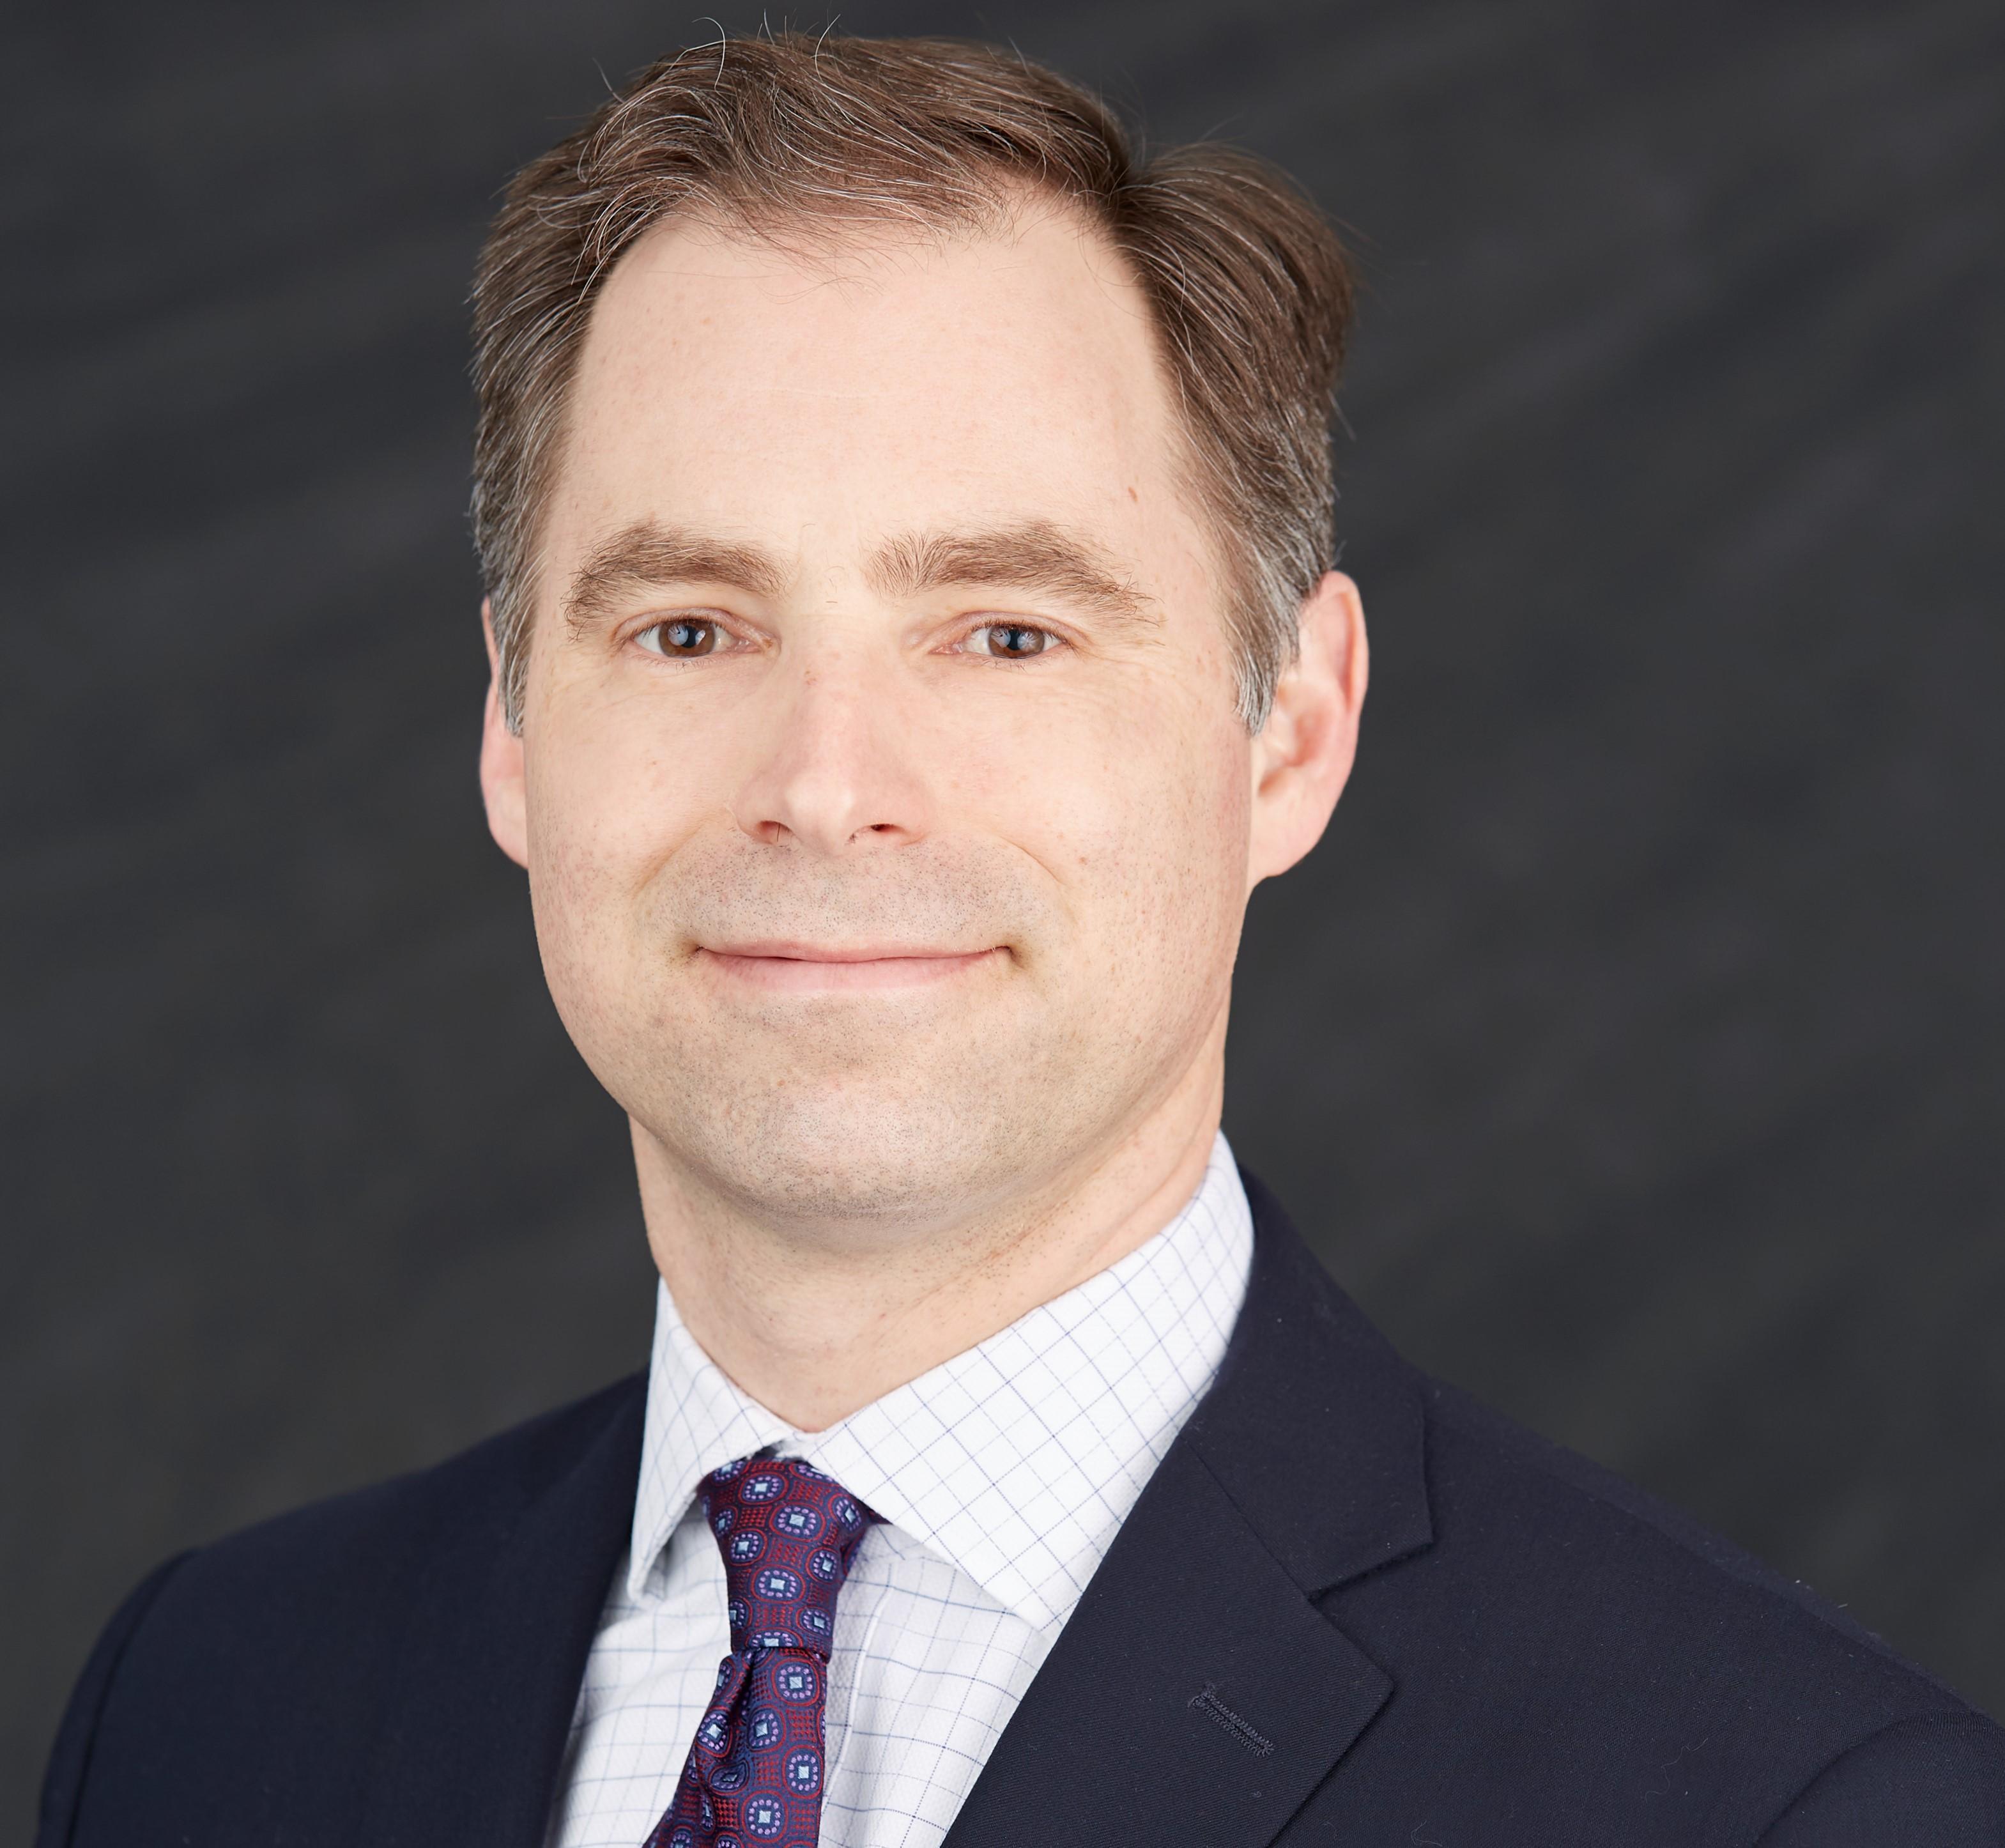 THOMAS J. PETERSON Your Financial Advisor